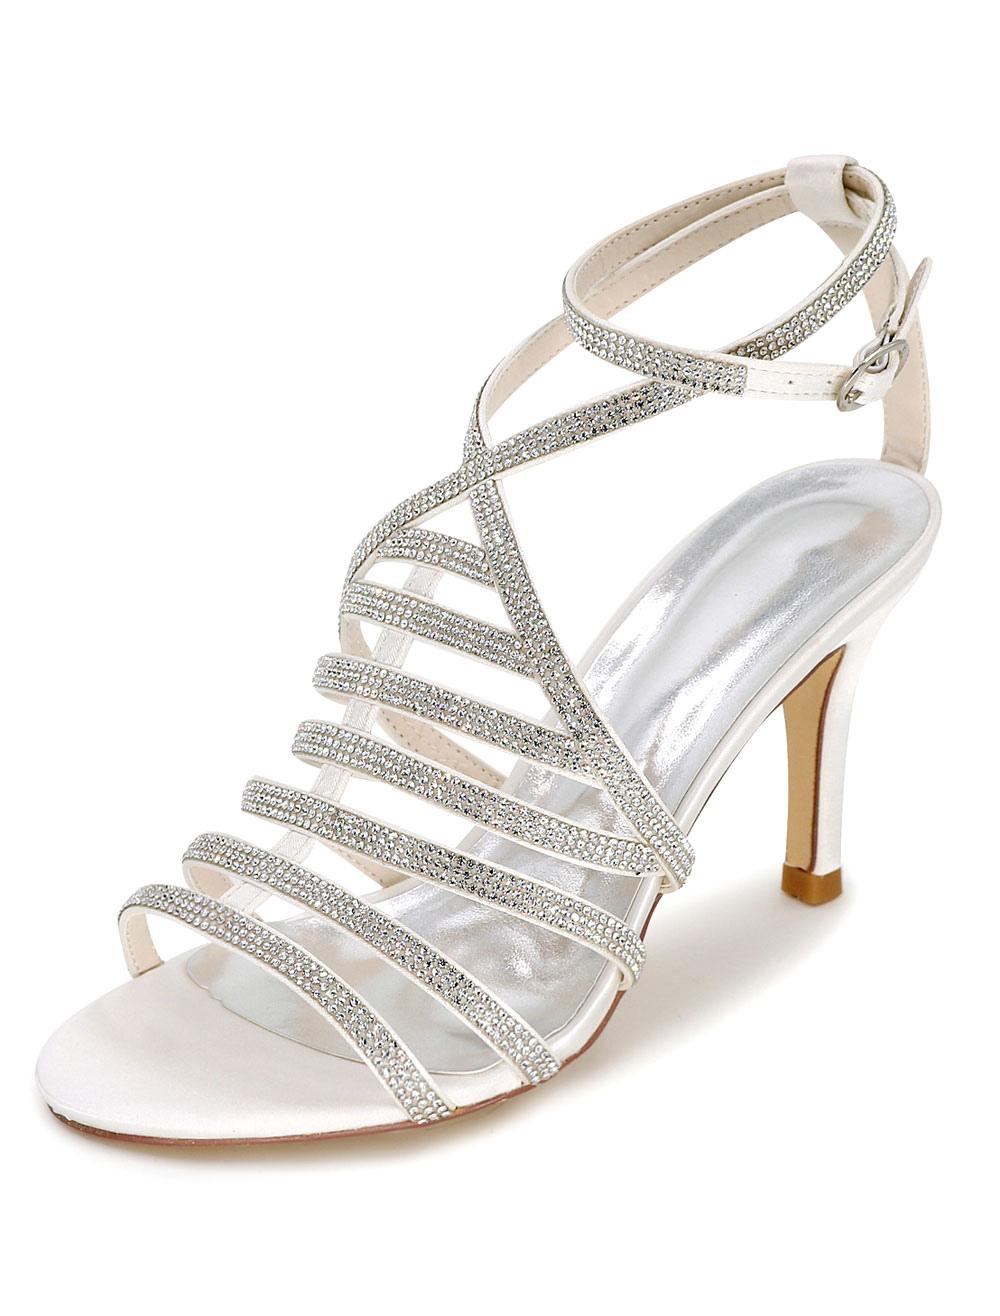 8e20bc25f1e91 White Wedding Shoes Gladiator Sandals Women s High Heel Rhinestones Ankle  Strap Bridal Shoes - Milanoo.com